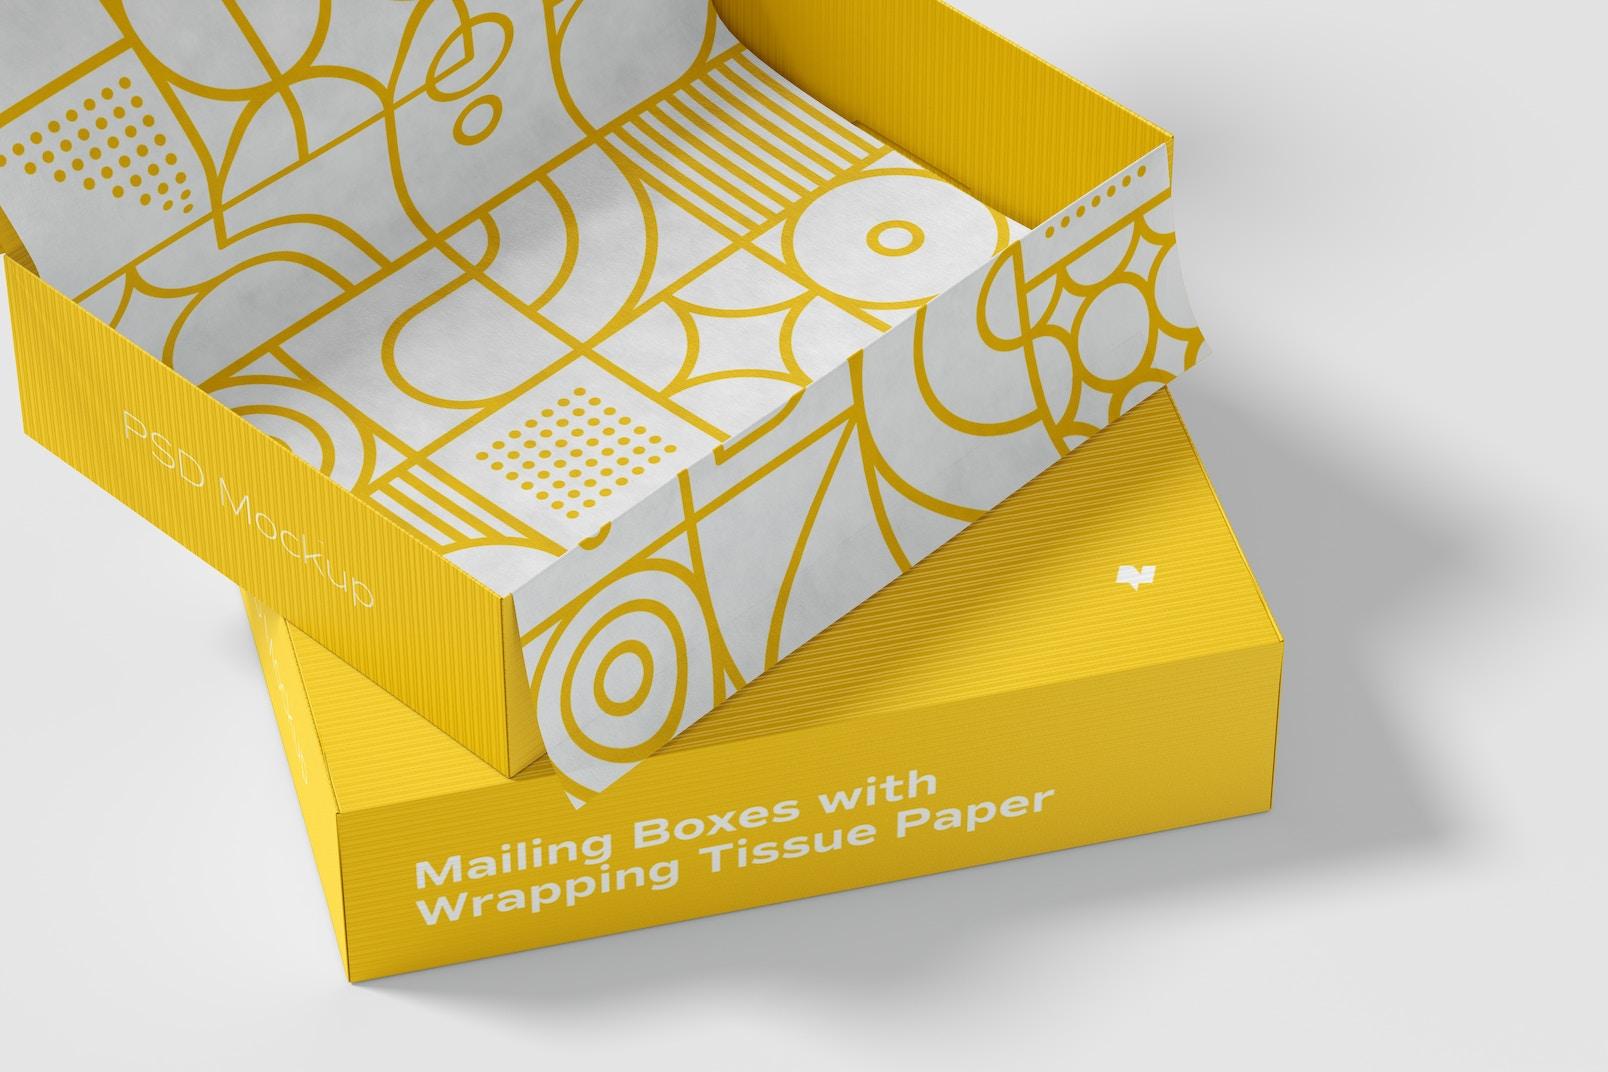 Maqueta de Cajas Para Envío con Papel de Envoltura, Primer Plano